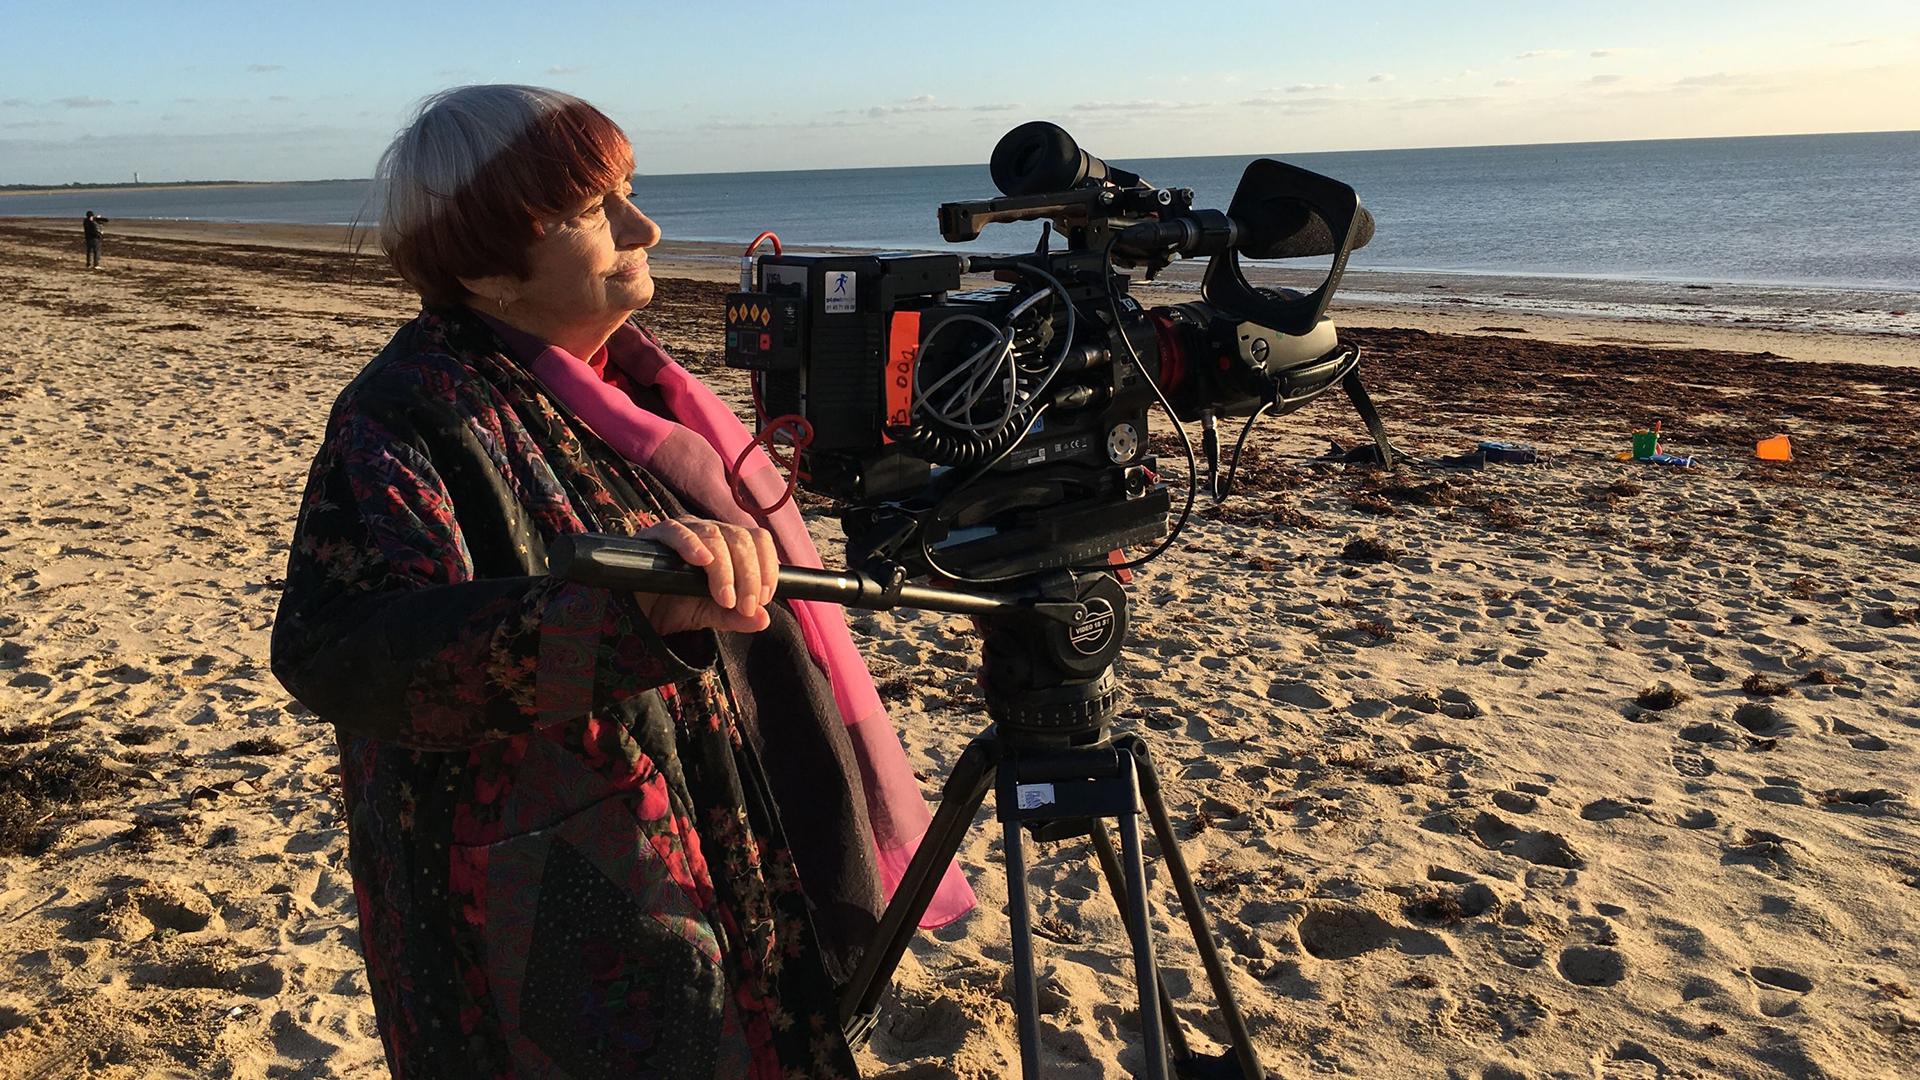 Varda by Agnès – The Genius' Last Talk